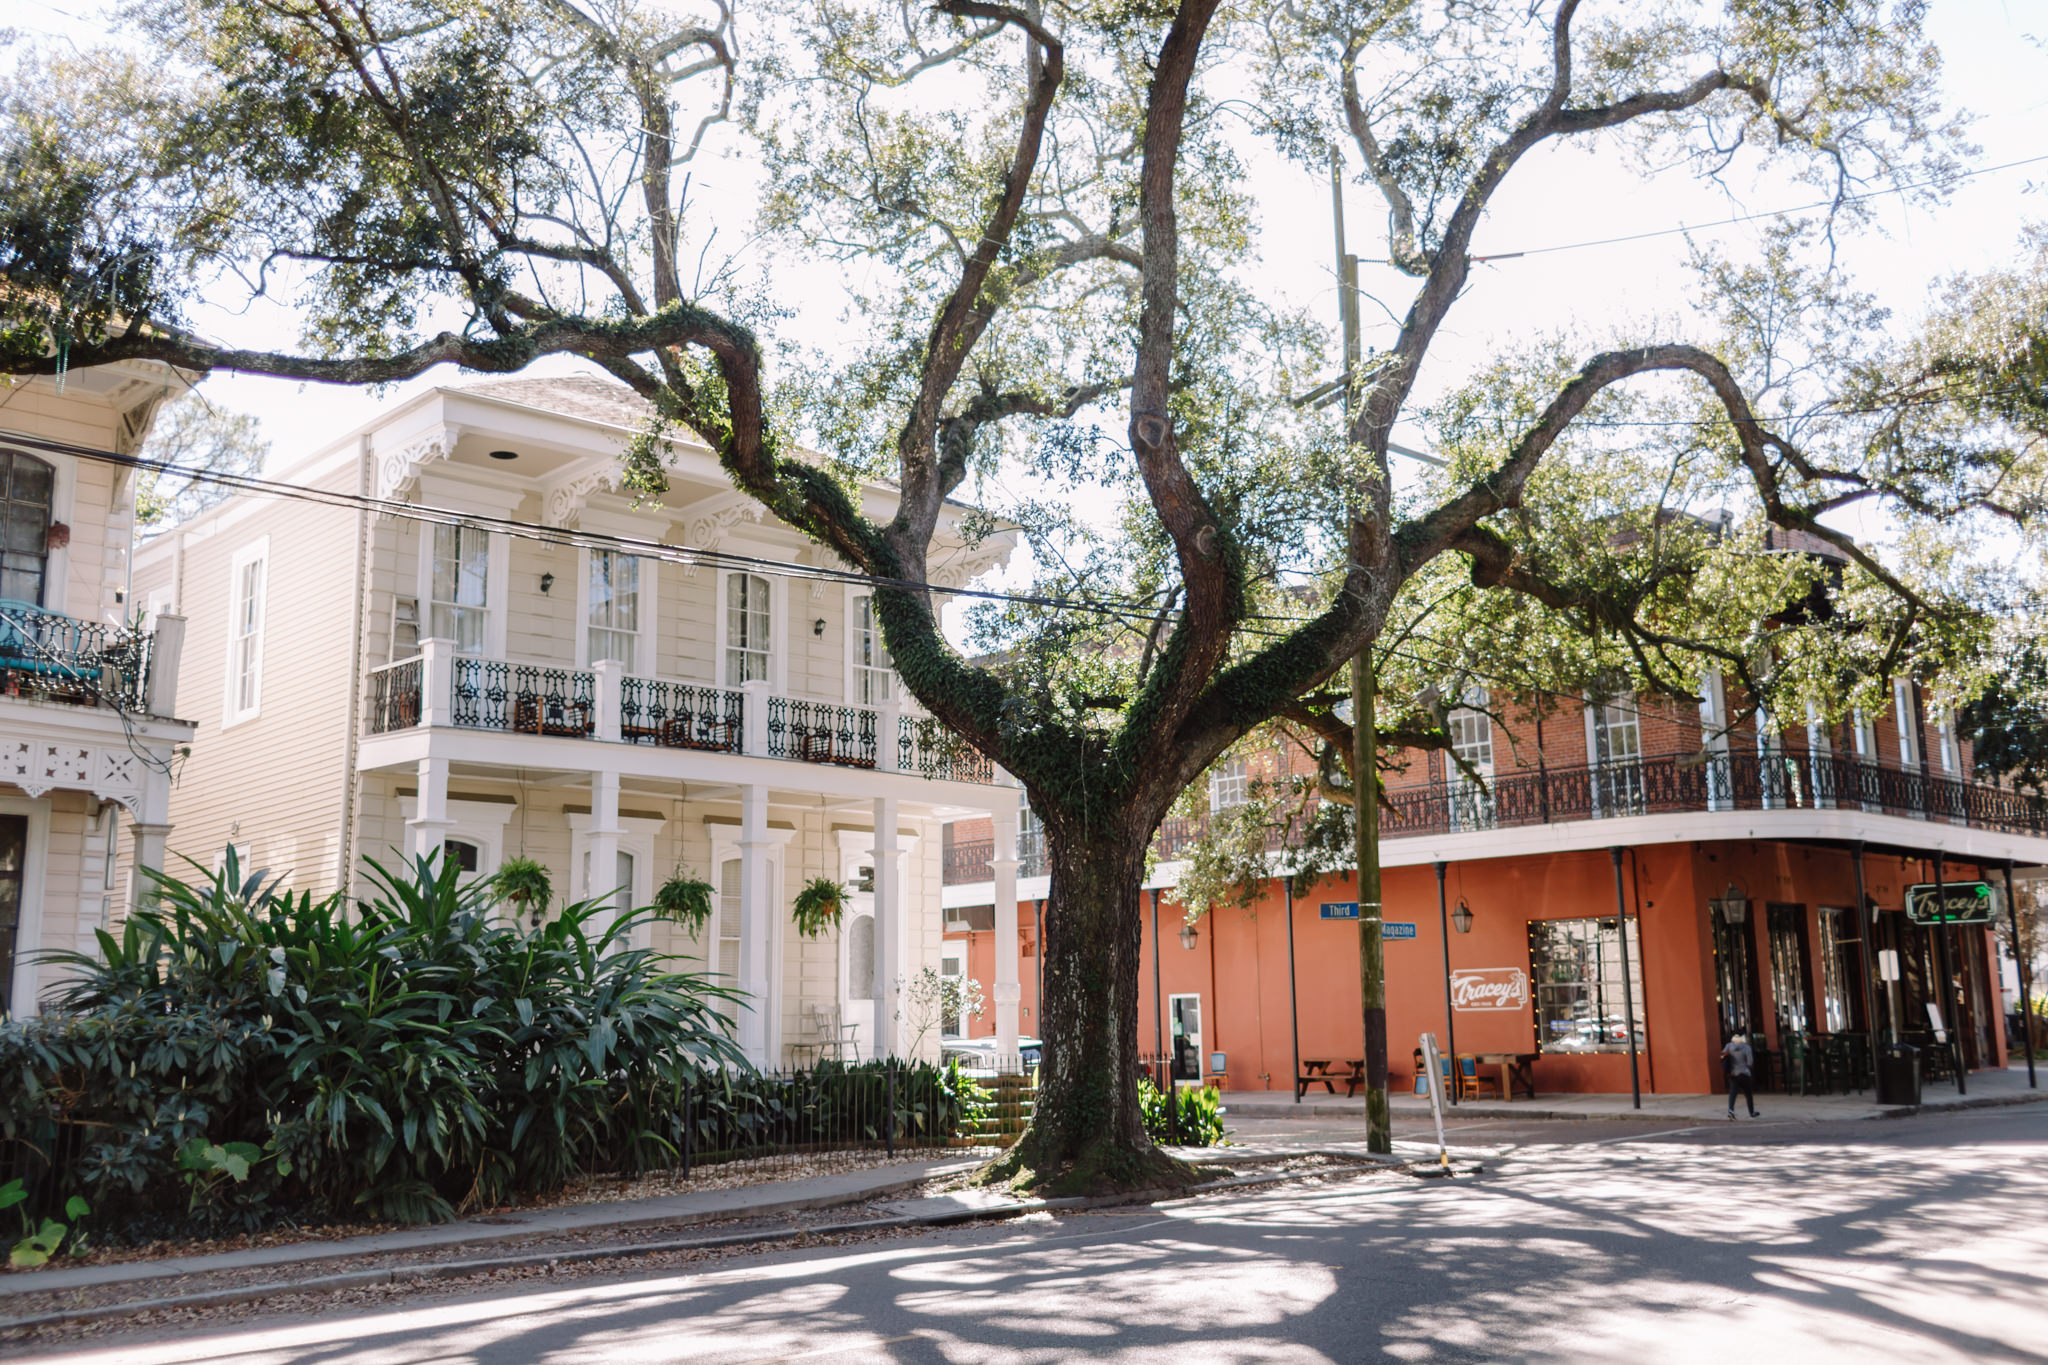 Tree in New Orleans street